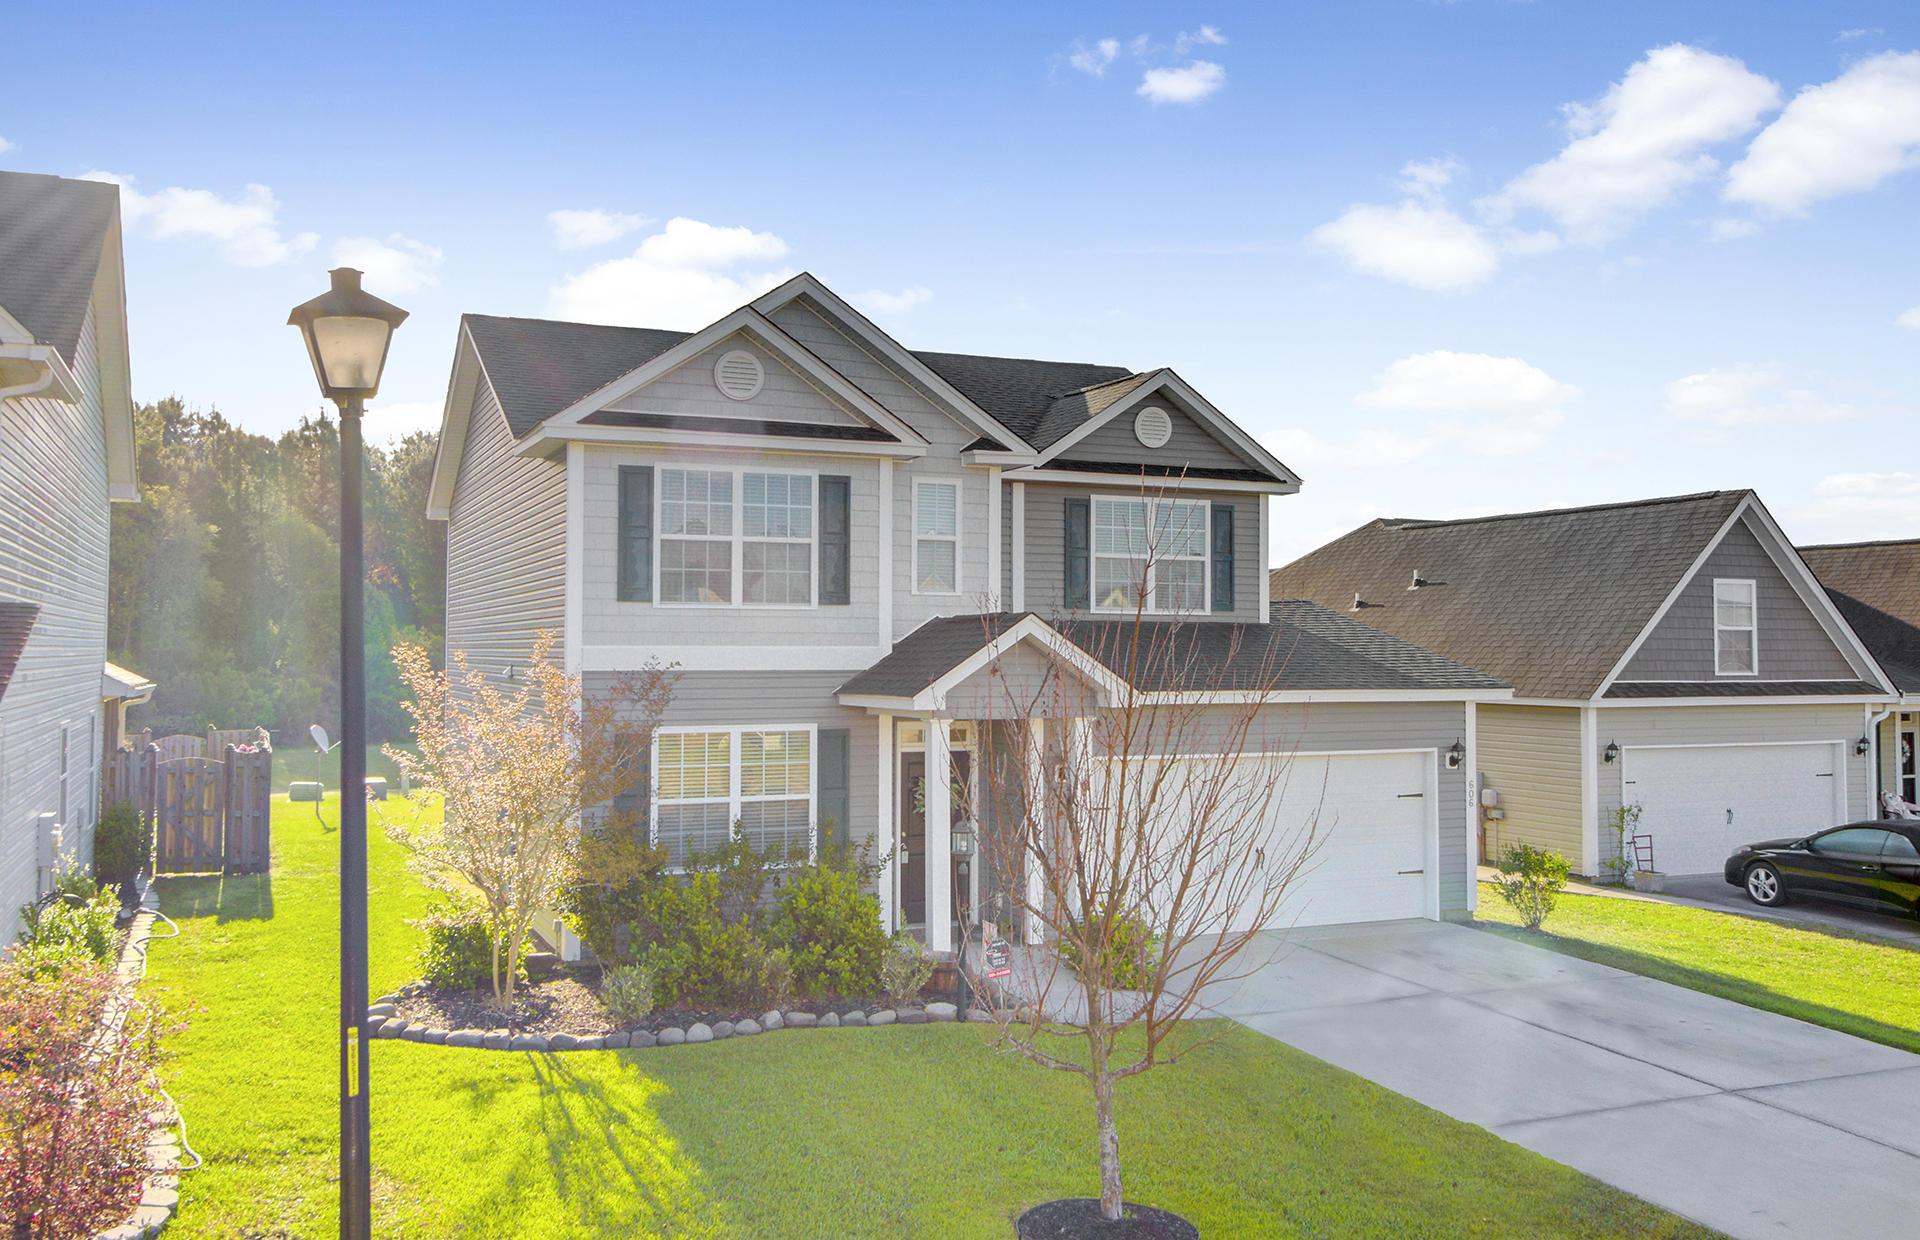 606 Kolb Court Goose Creek, SC 29445